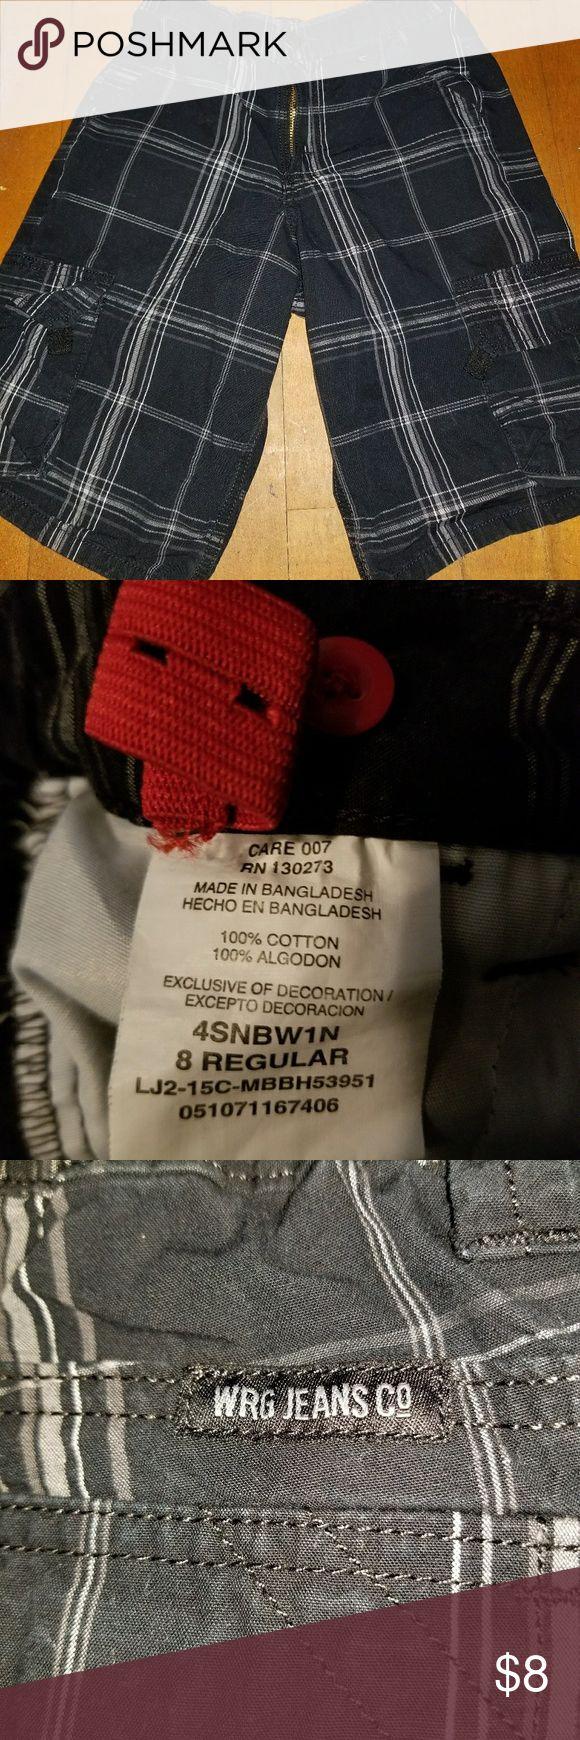 Boys cargo shorts Hardly worn. Great condition. Has tabs inside to tighten waist. Wrangler Bottoms Shorts